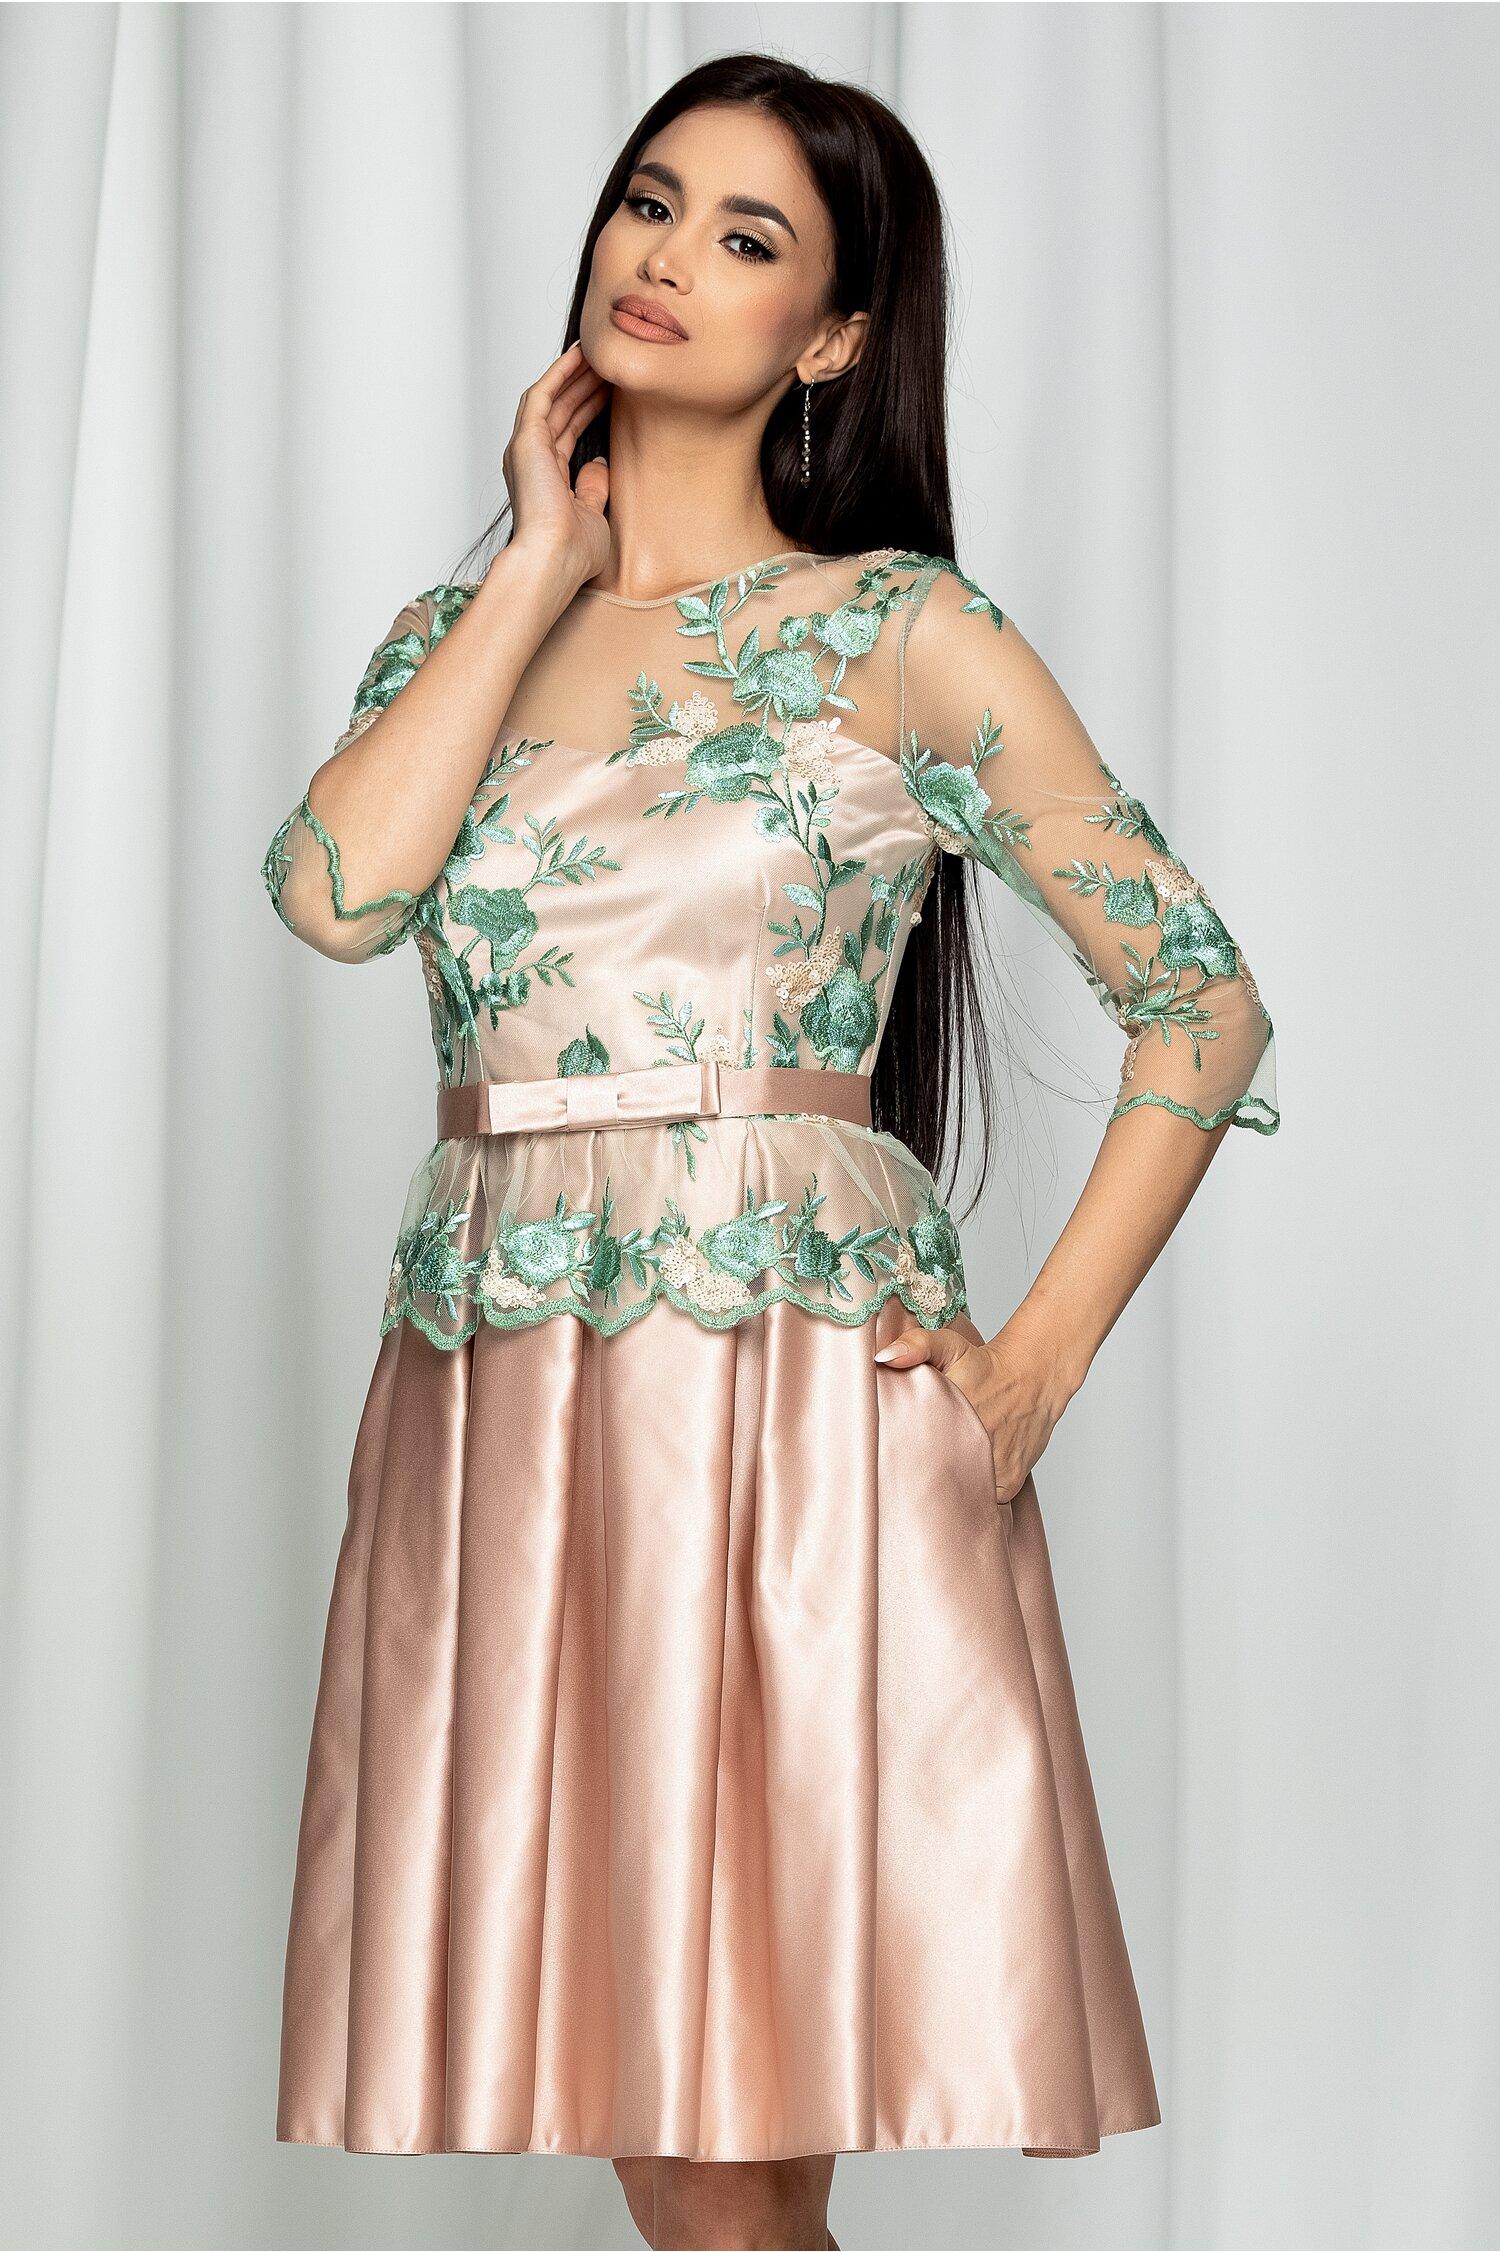 Rochie MBG roz cu broderie florala verde si talie marcata